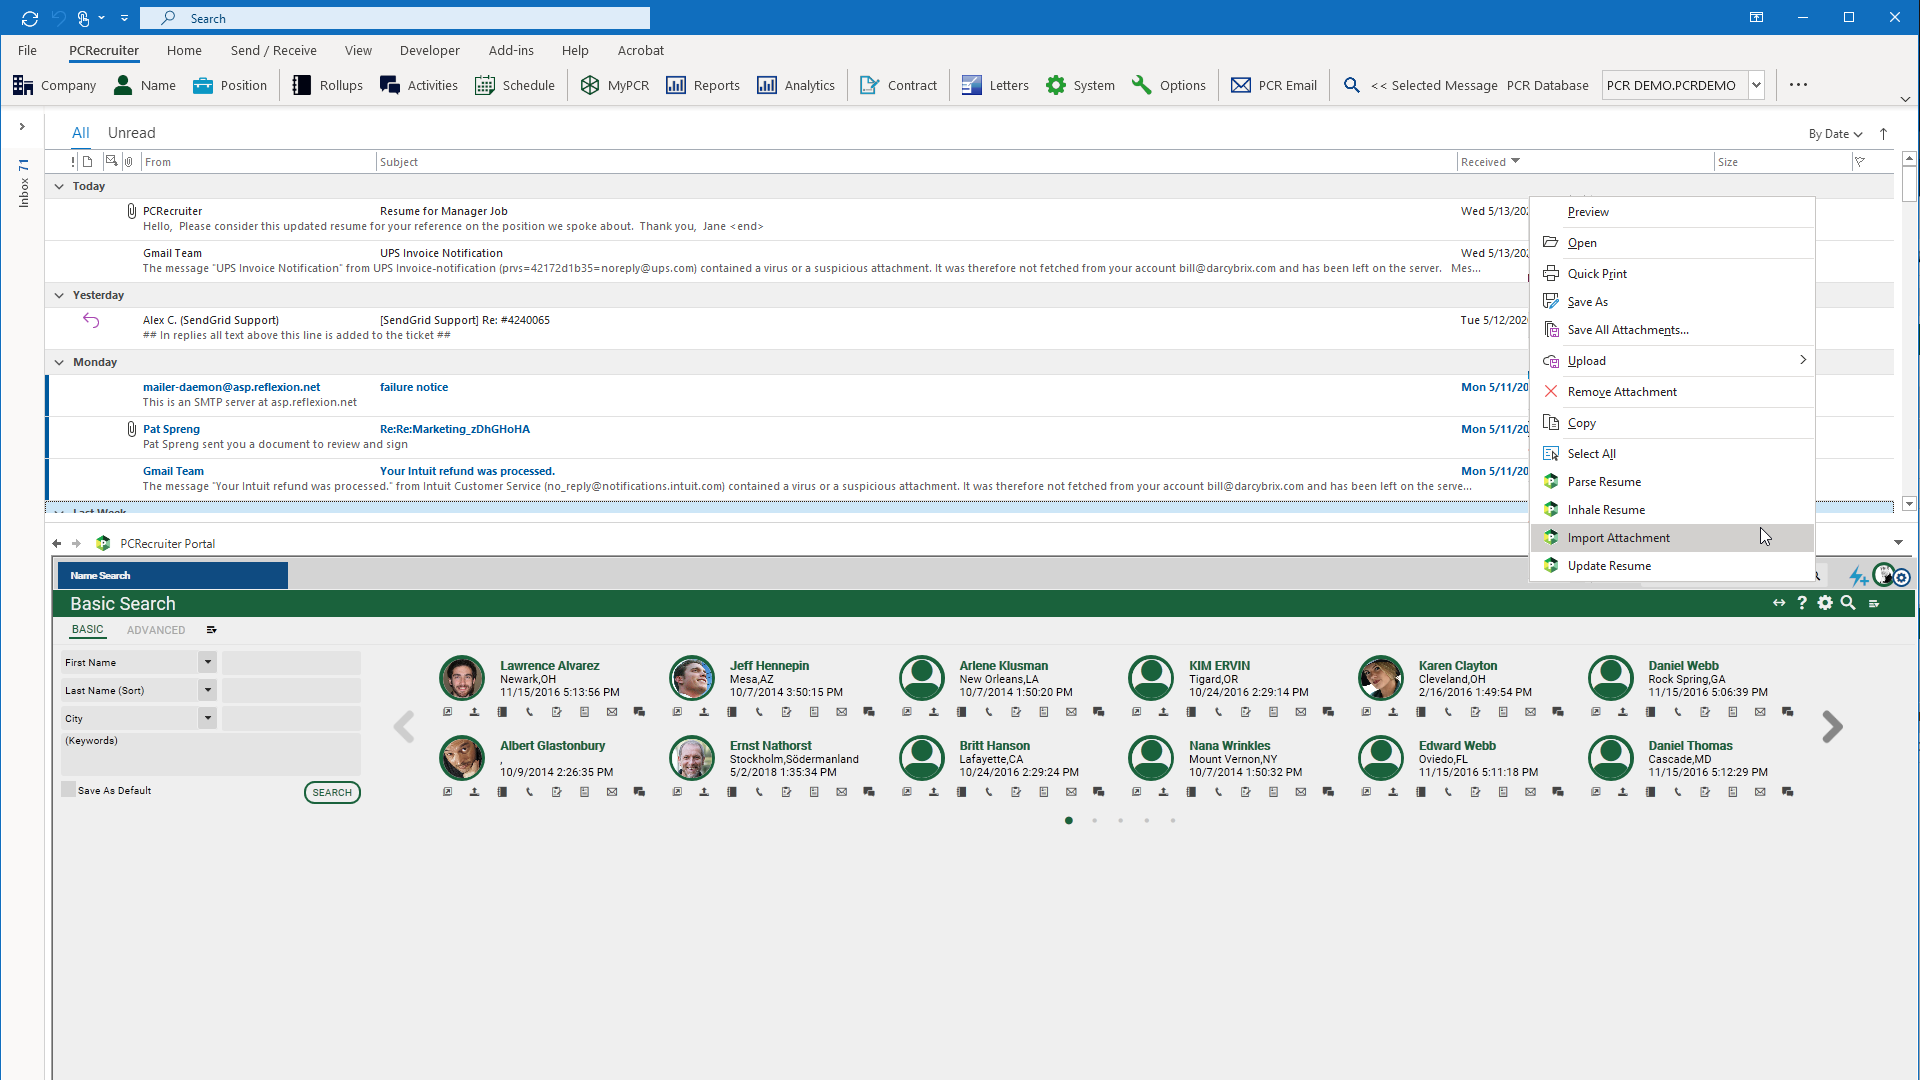 MS Outlook Integration